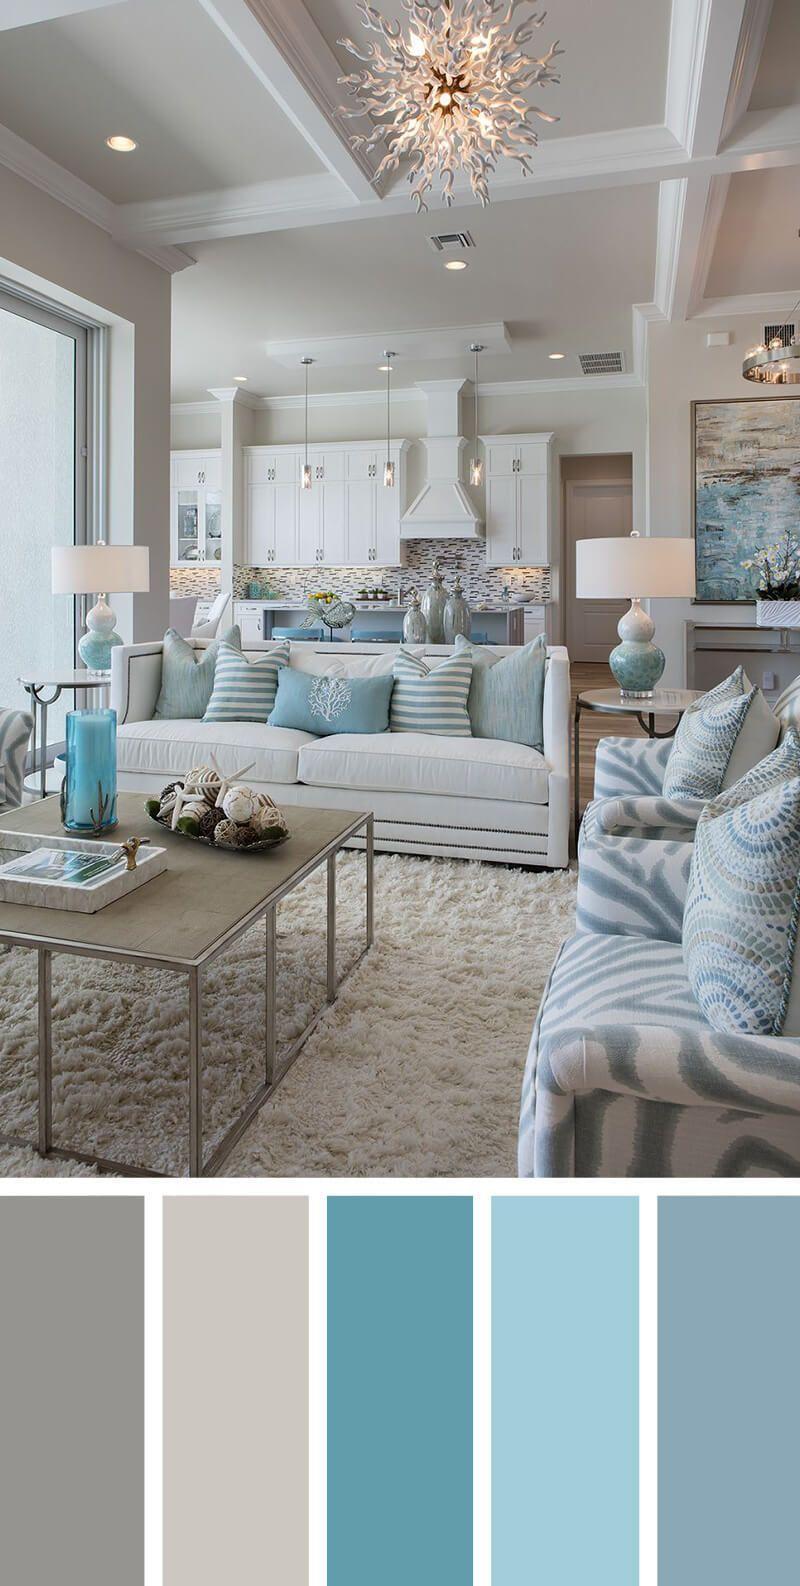 Florida Homes Decor Coastal Style 15 Best Decoration Ideas